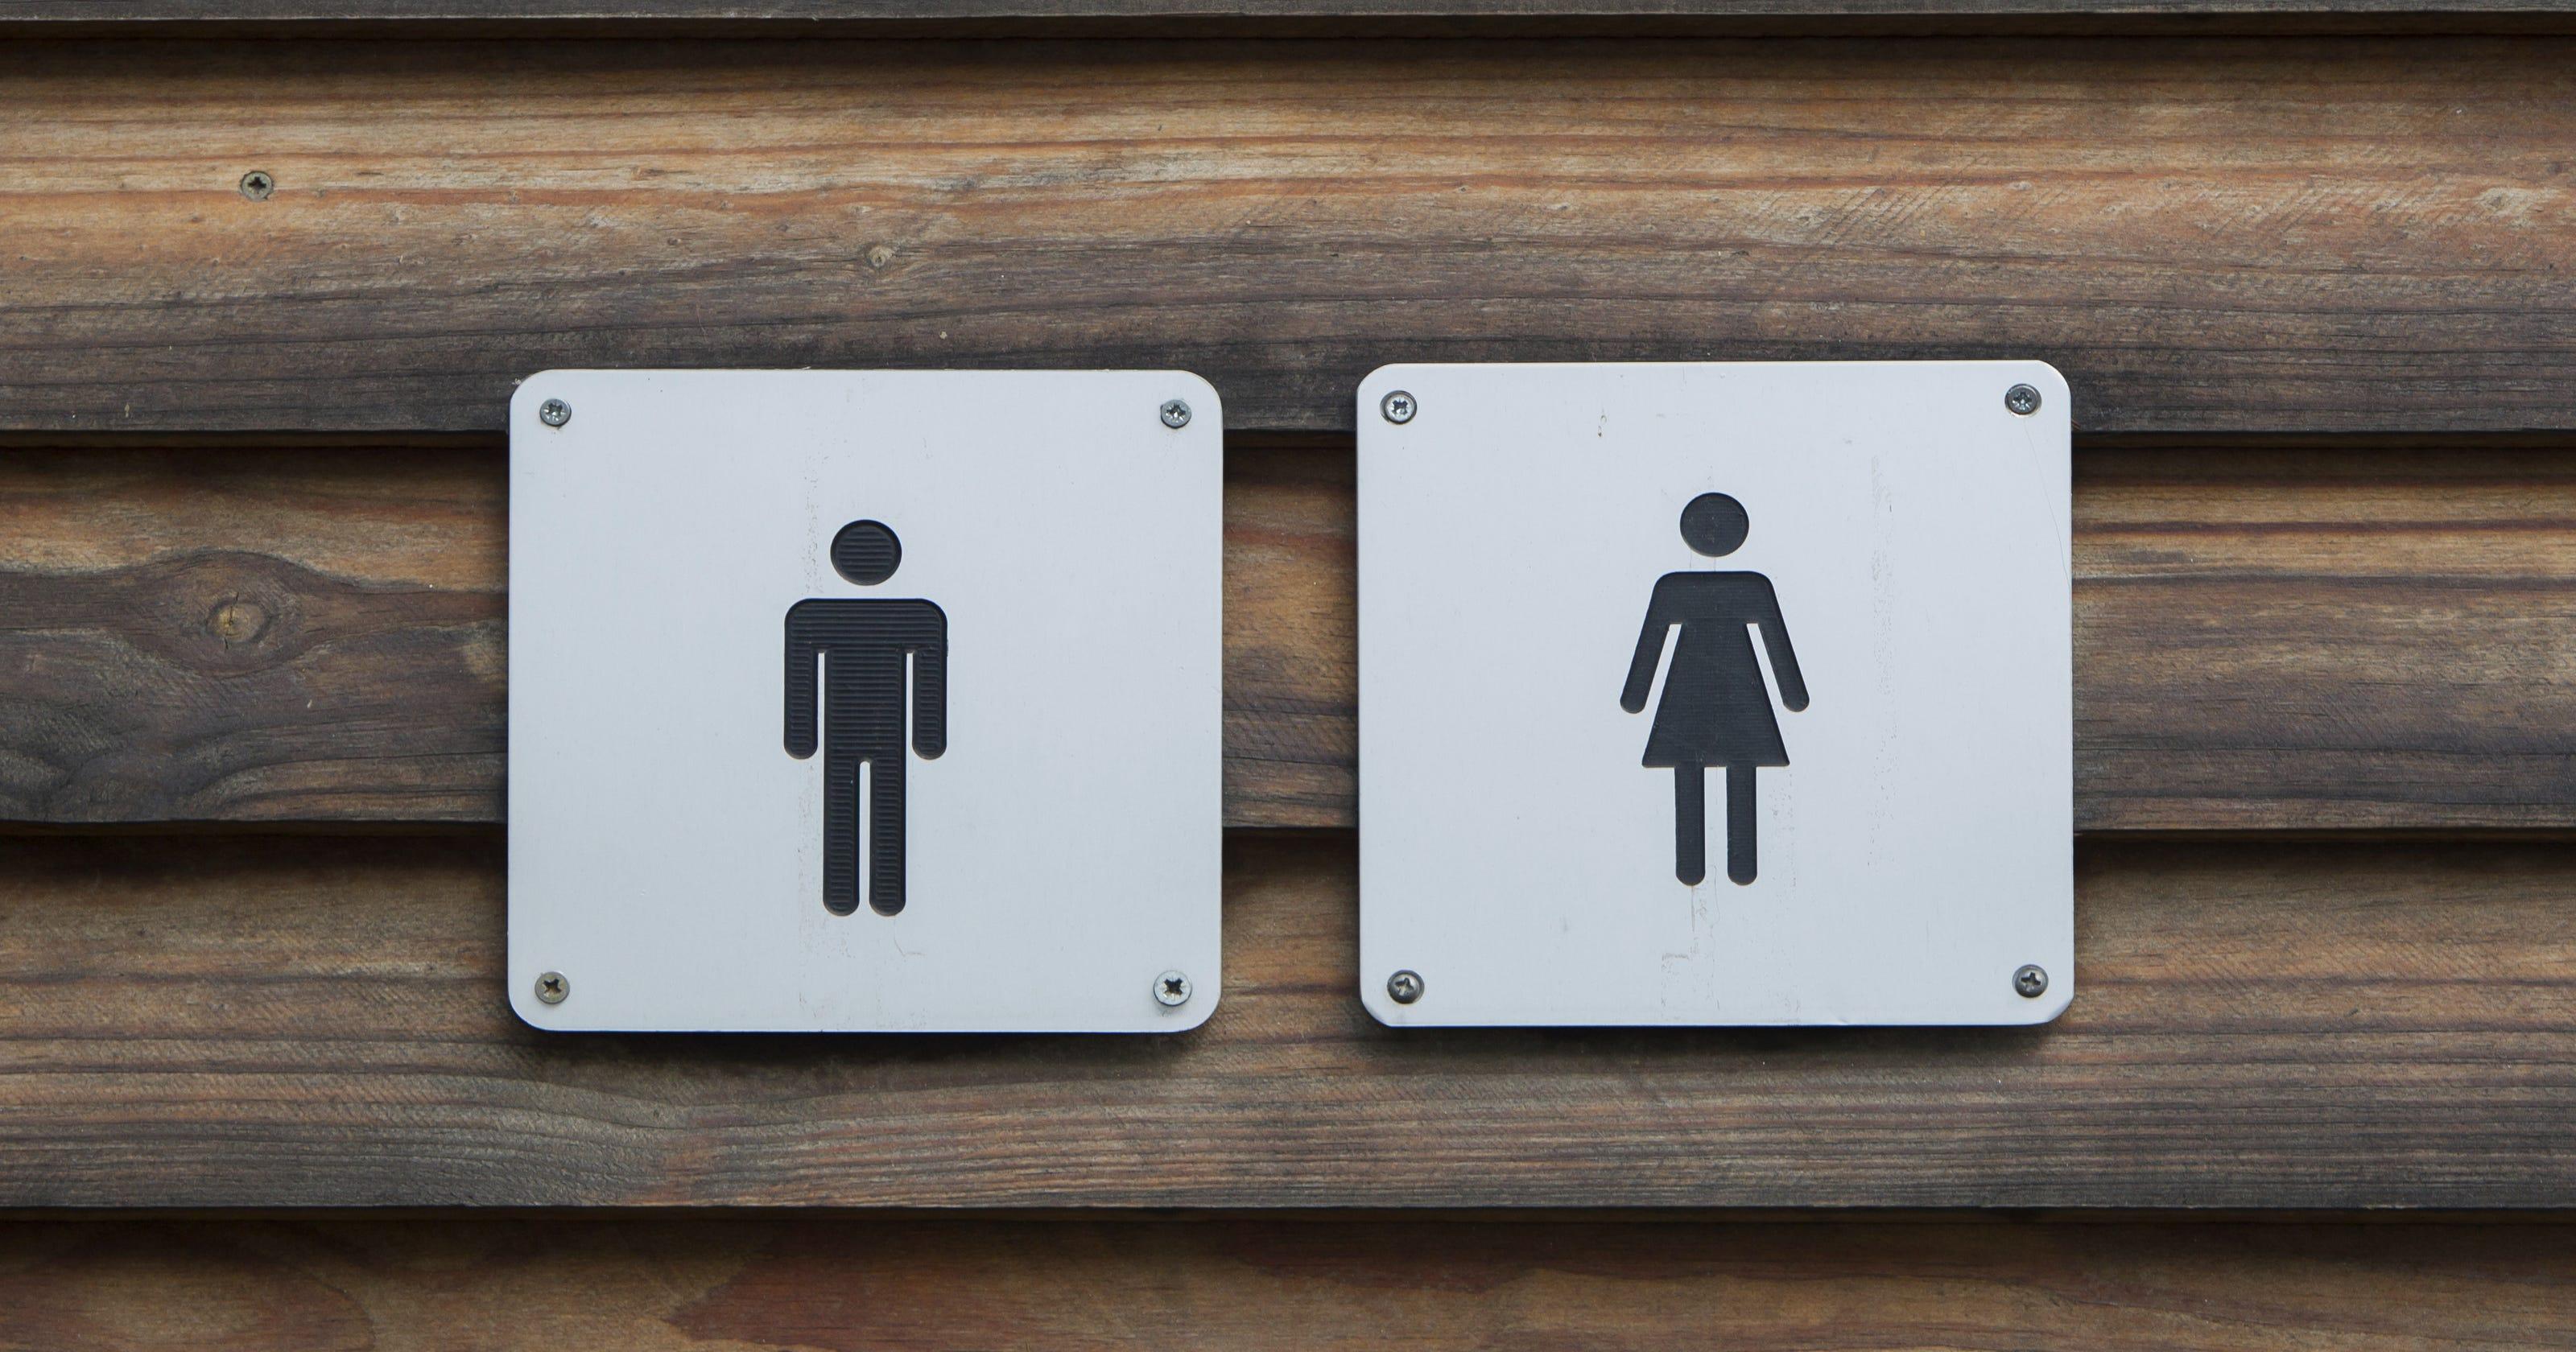 The imaginary predator in America's transgender bathroom war